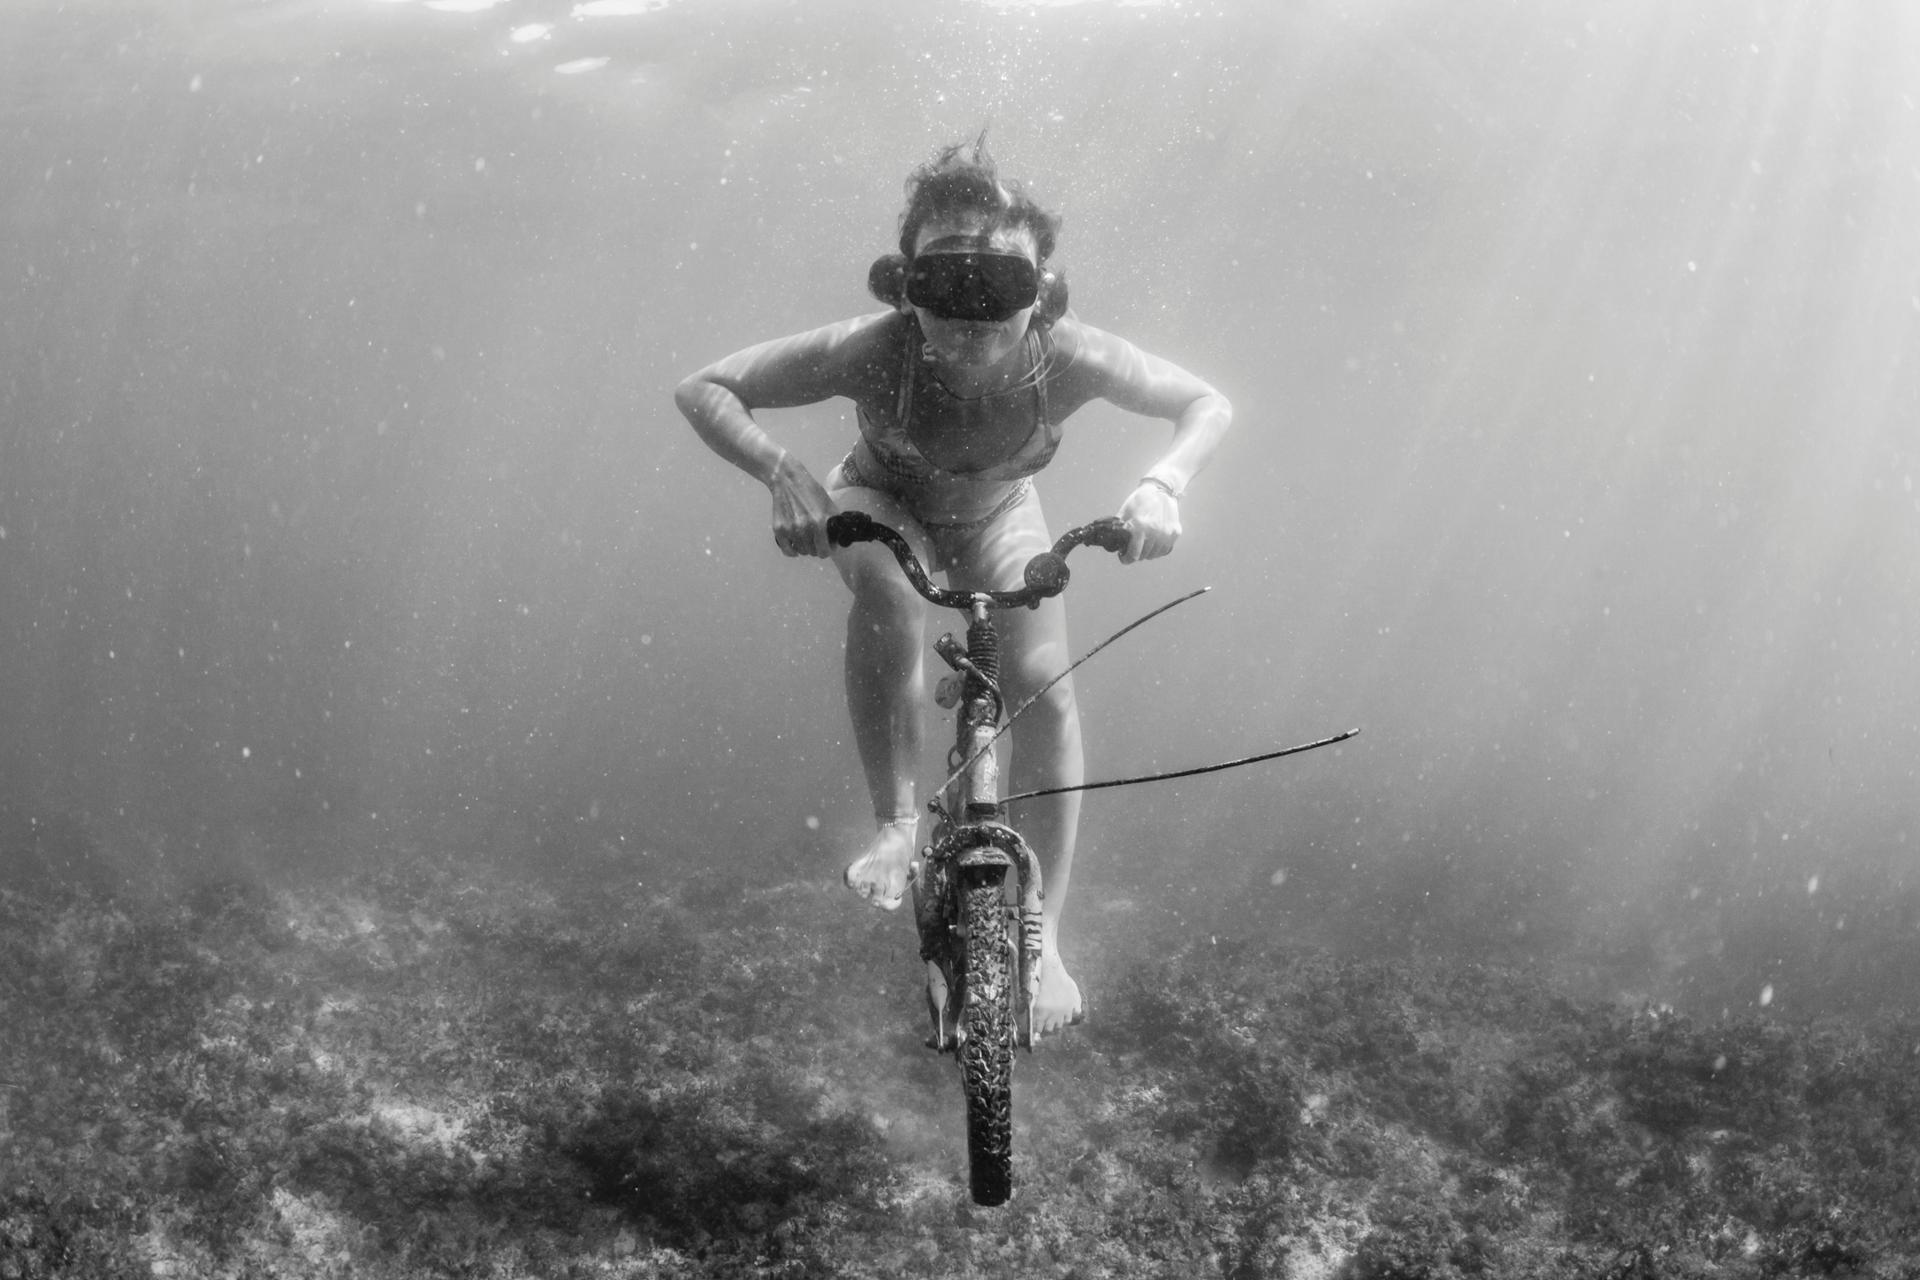 Subaqua-biking